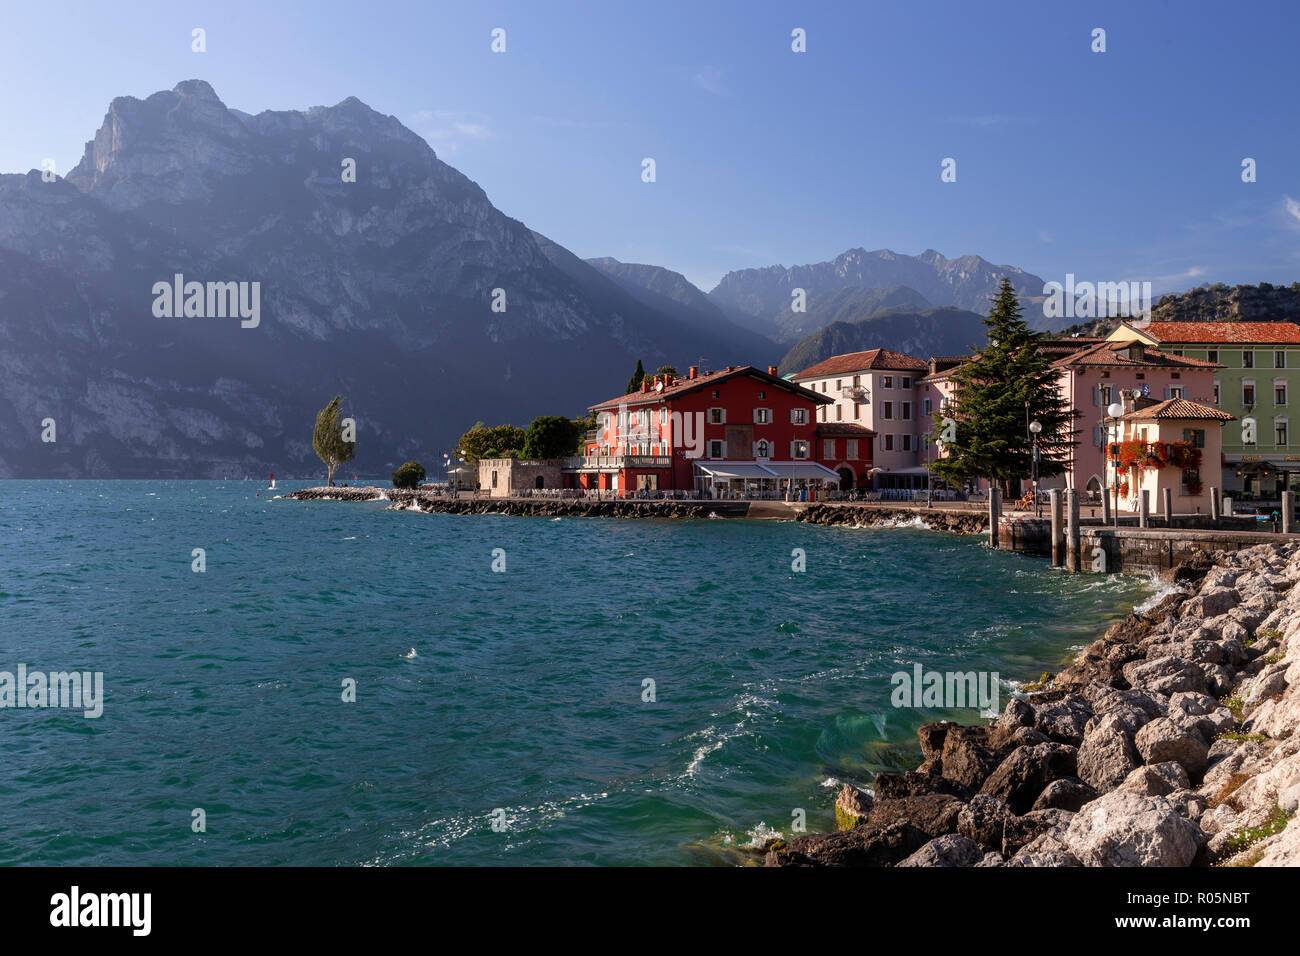 Torbole near Riva del Garda on Lake Garda in northern Italy Stock Photo